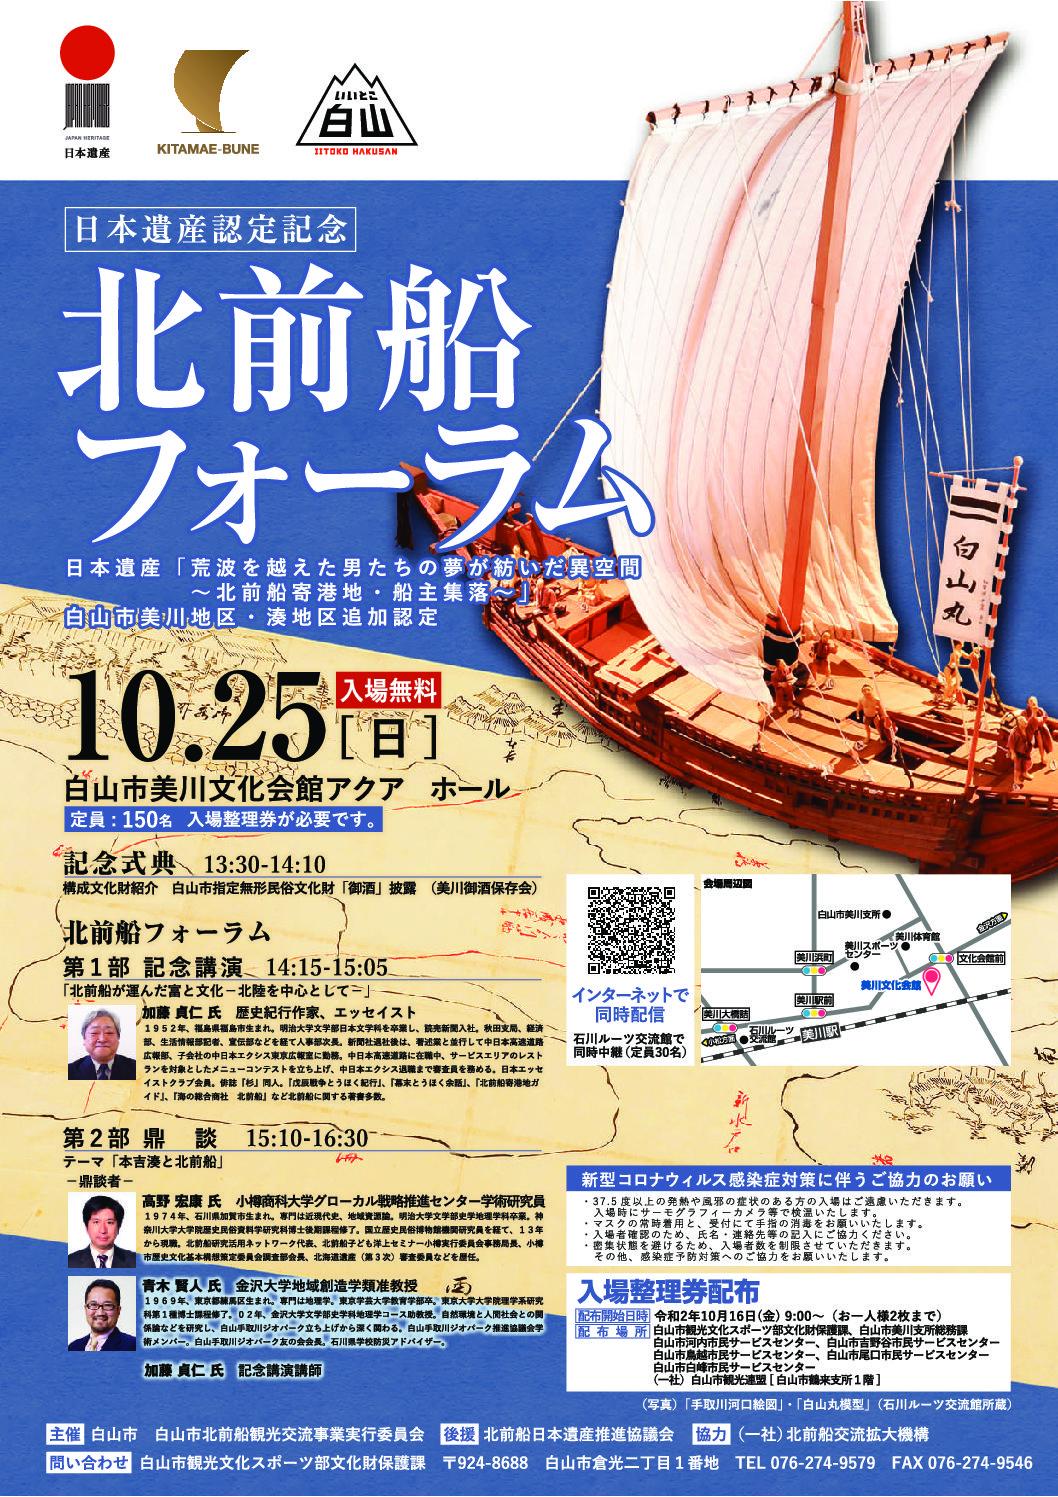 白山市主催 日本遺産認定記念 北前船フォーラム 開催!